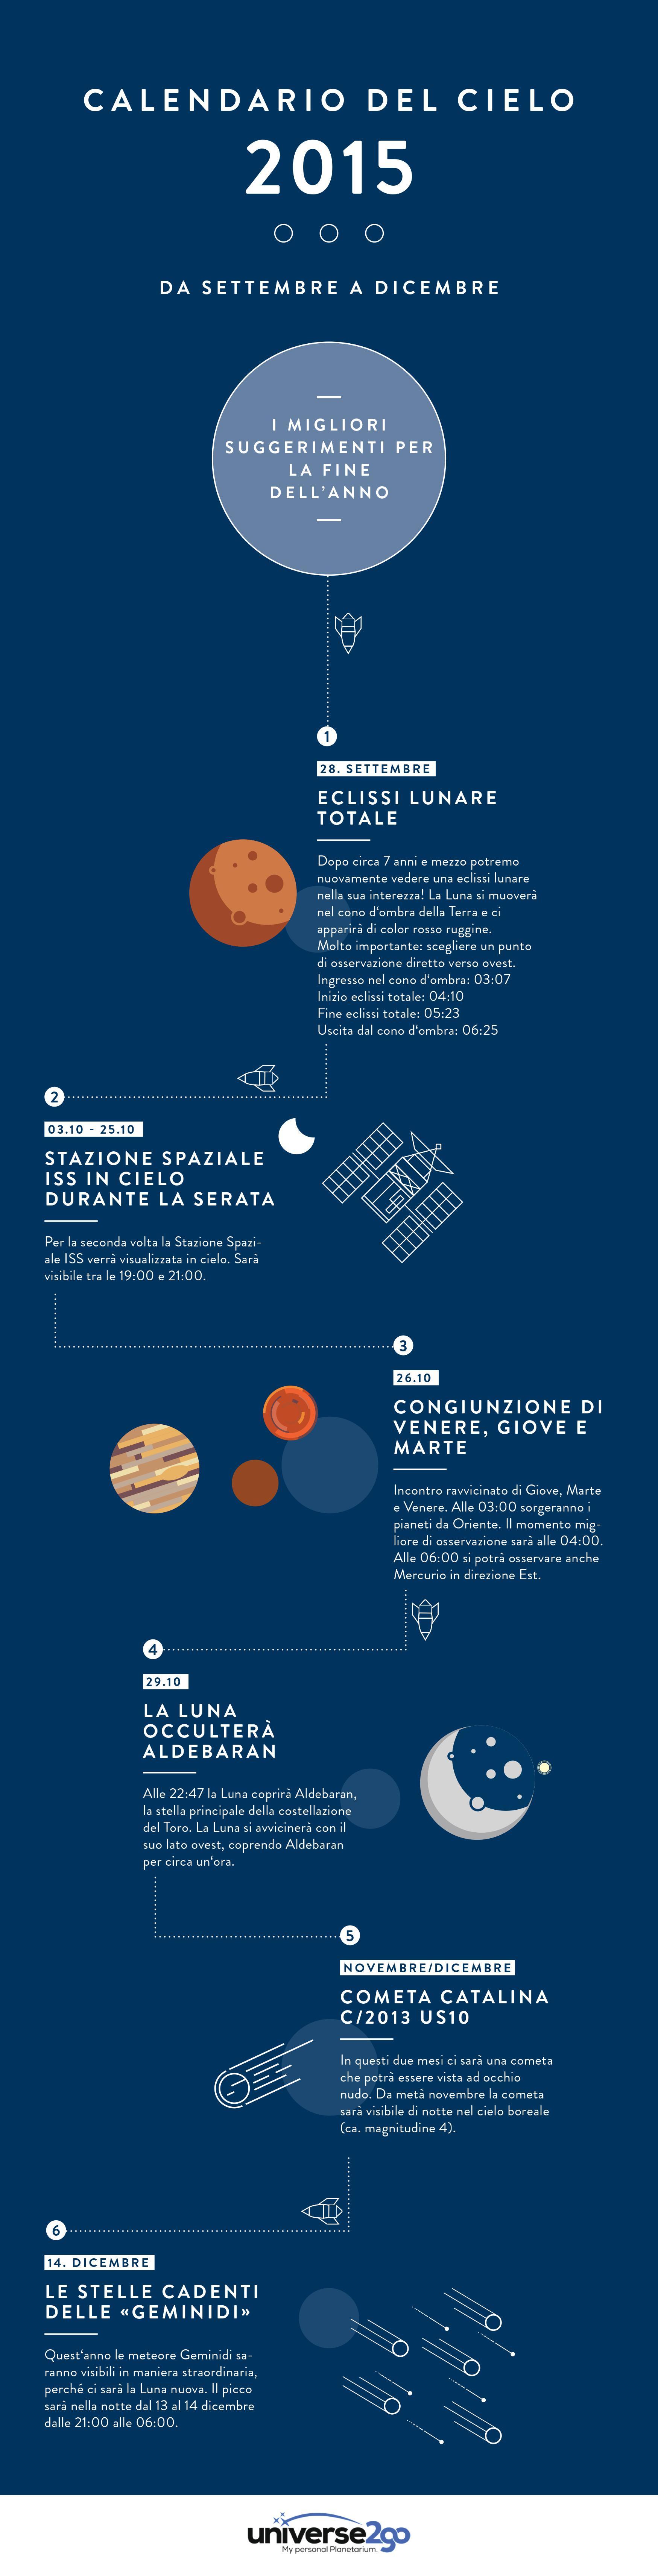 Infografica - Calendario del Cielo 2015